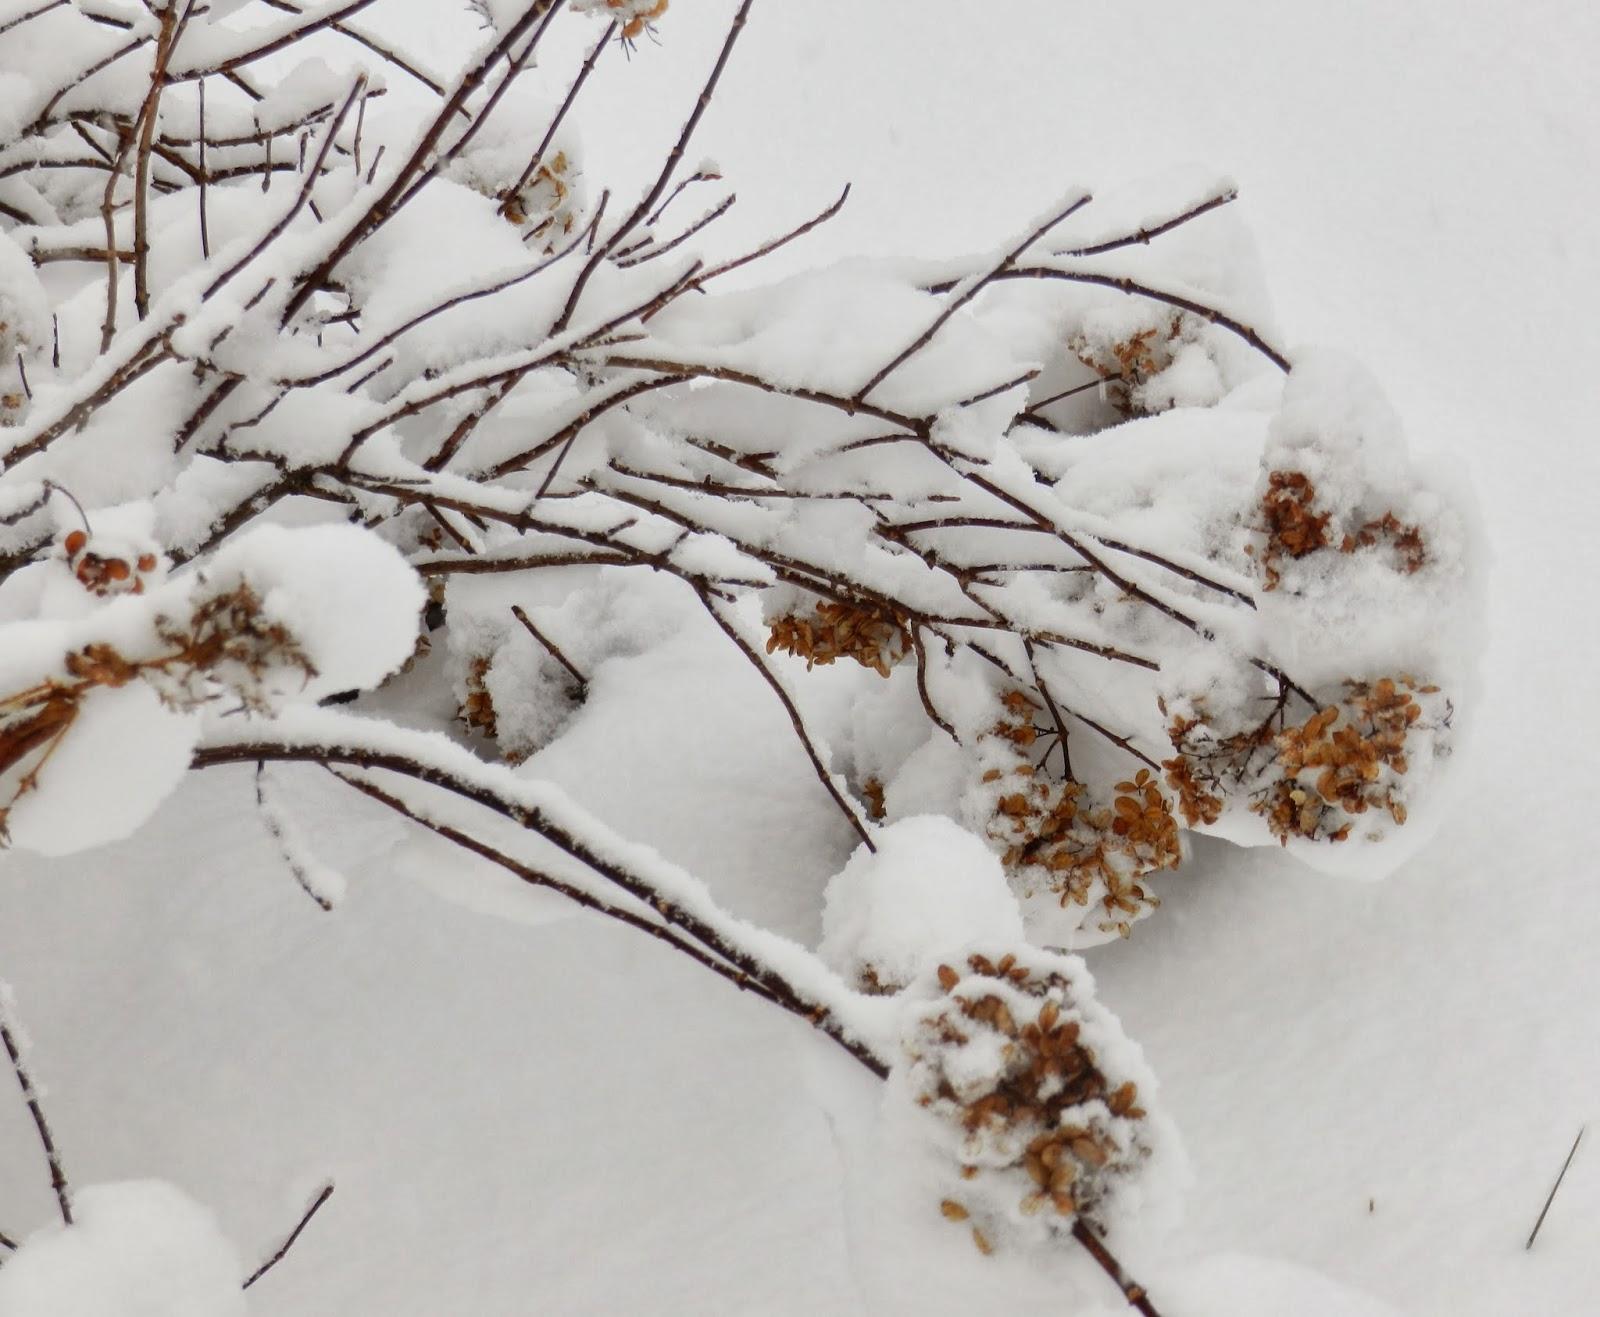 Prairie Rose's Garden: December 2013